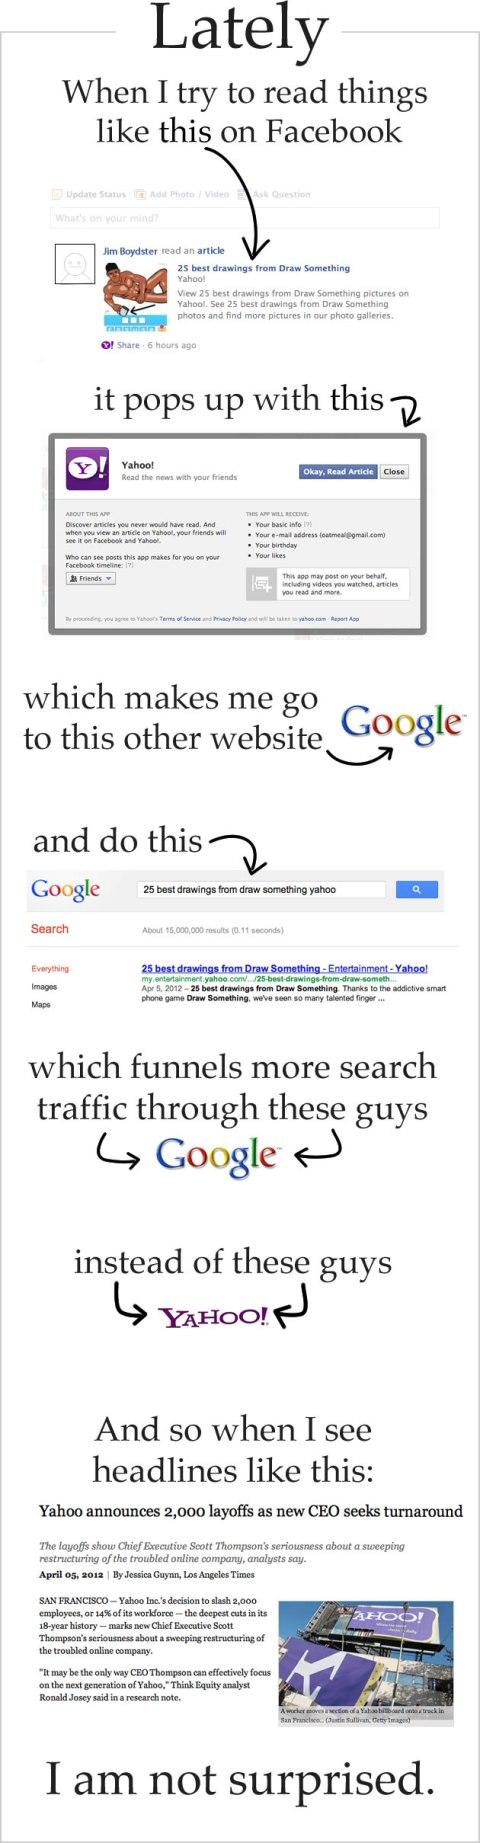 Infographic Yahoo! Facebook Google